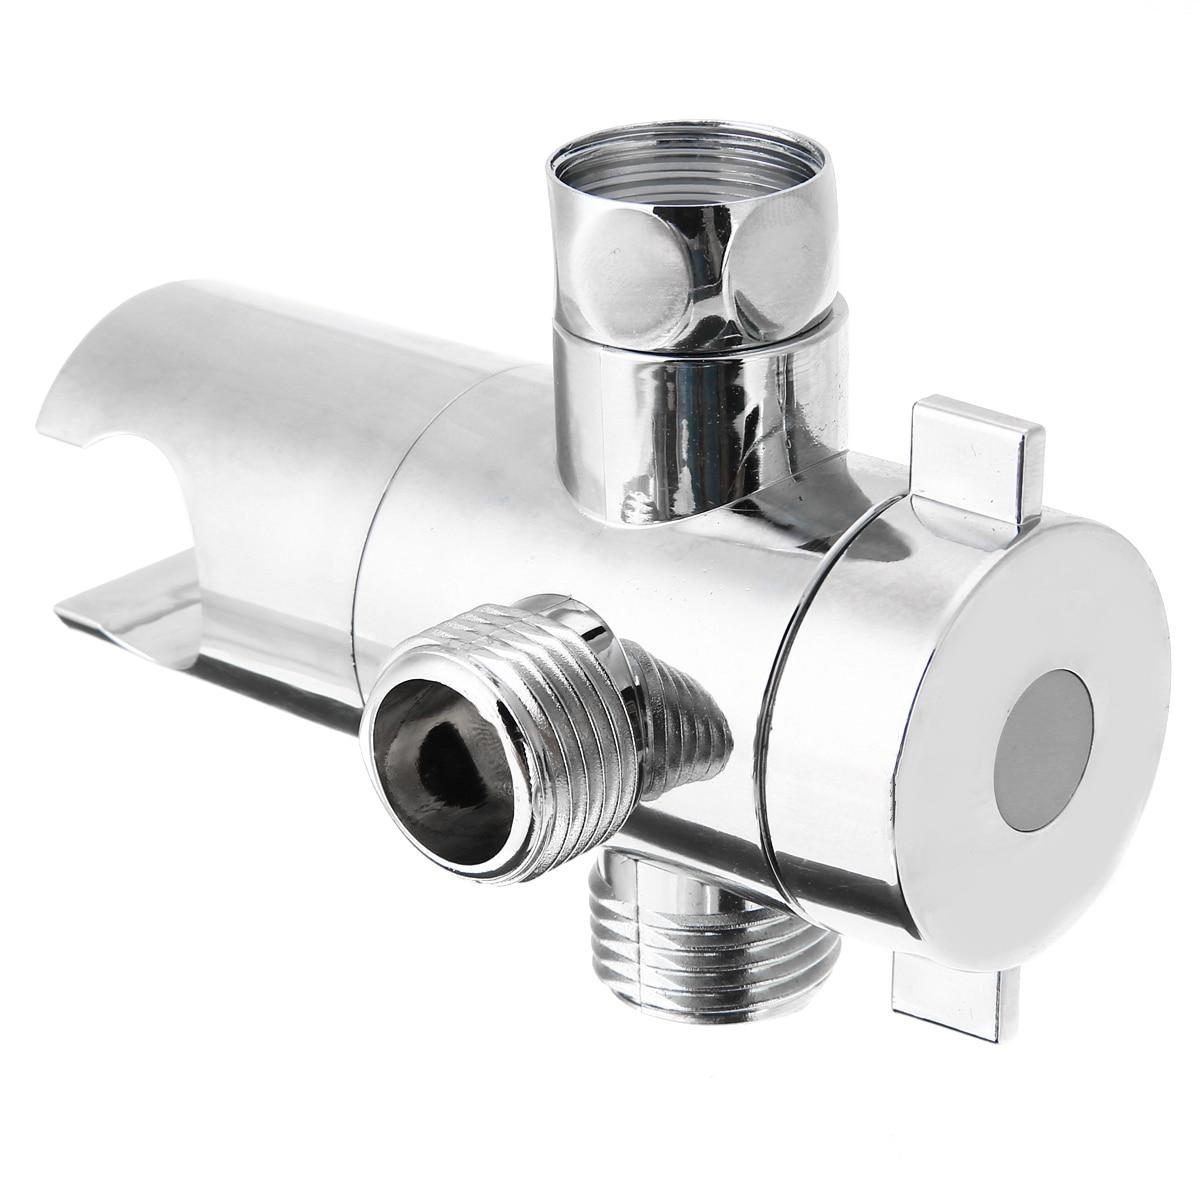 Us 3 55 40 Off Fix Bracket Abs Bathroom Shower Head Diverter Sprayer Arm Mount 3 Way Valve For Bathroom Hardware In Shower Heads From Home